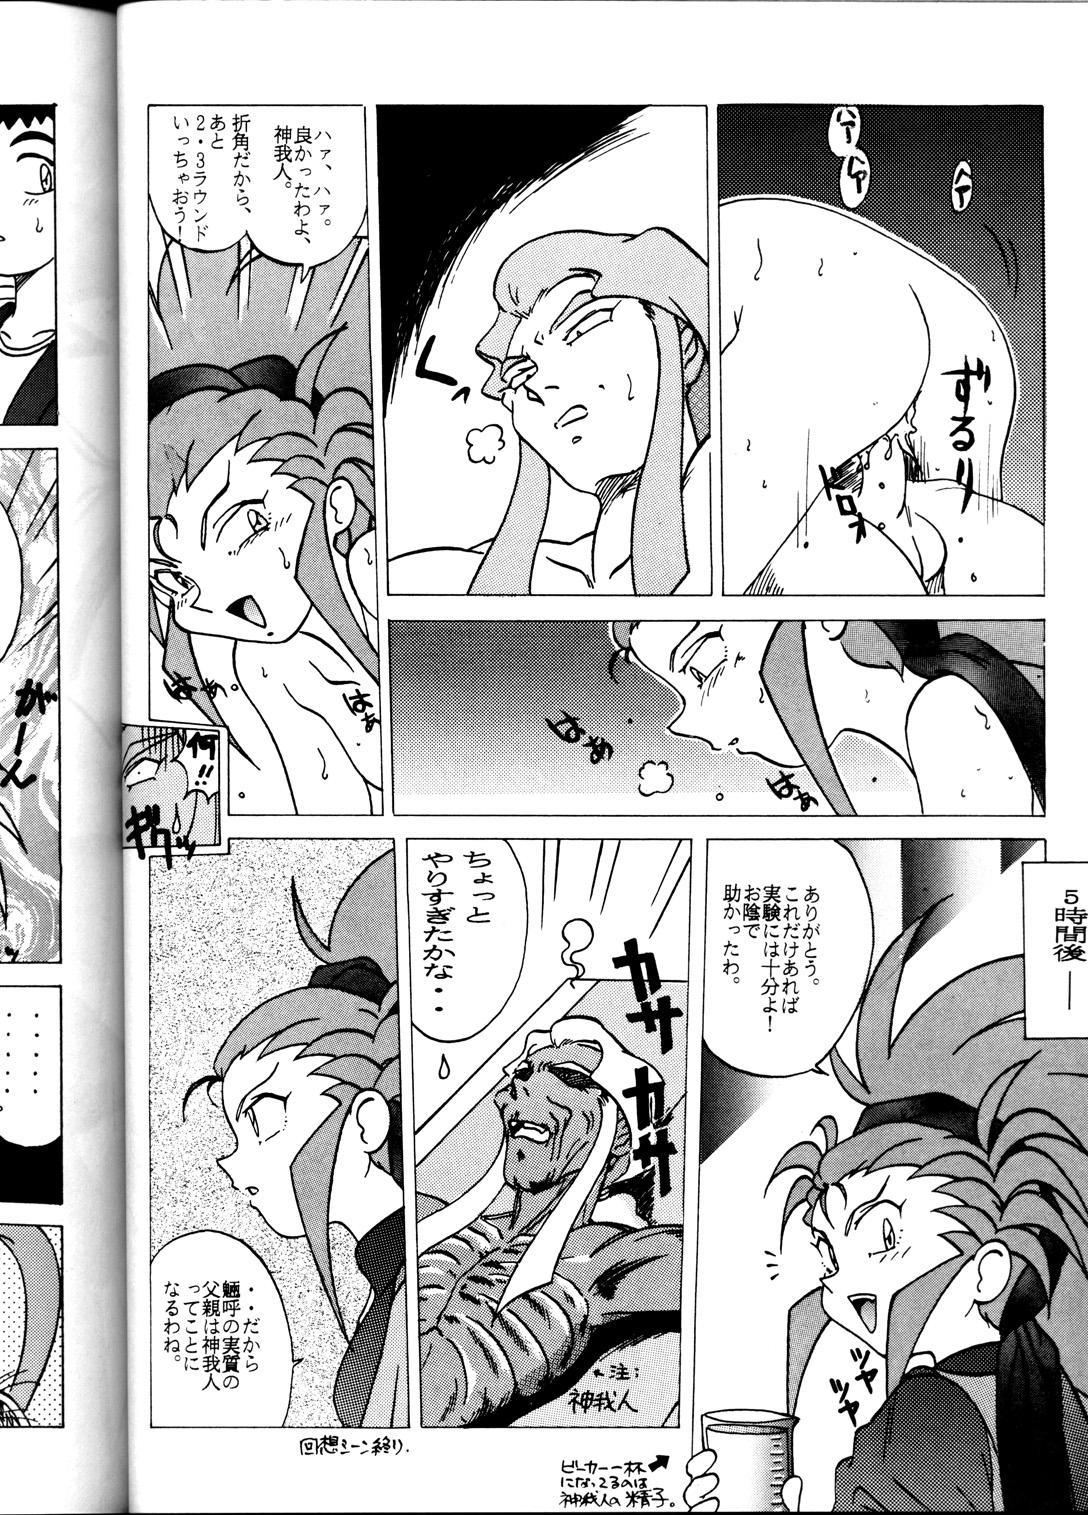 Tenchi Muyou! Sample Vol 6 38